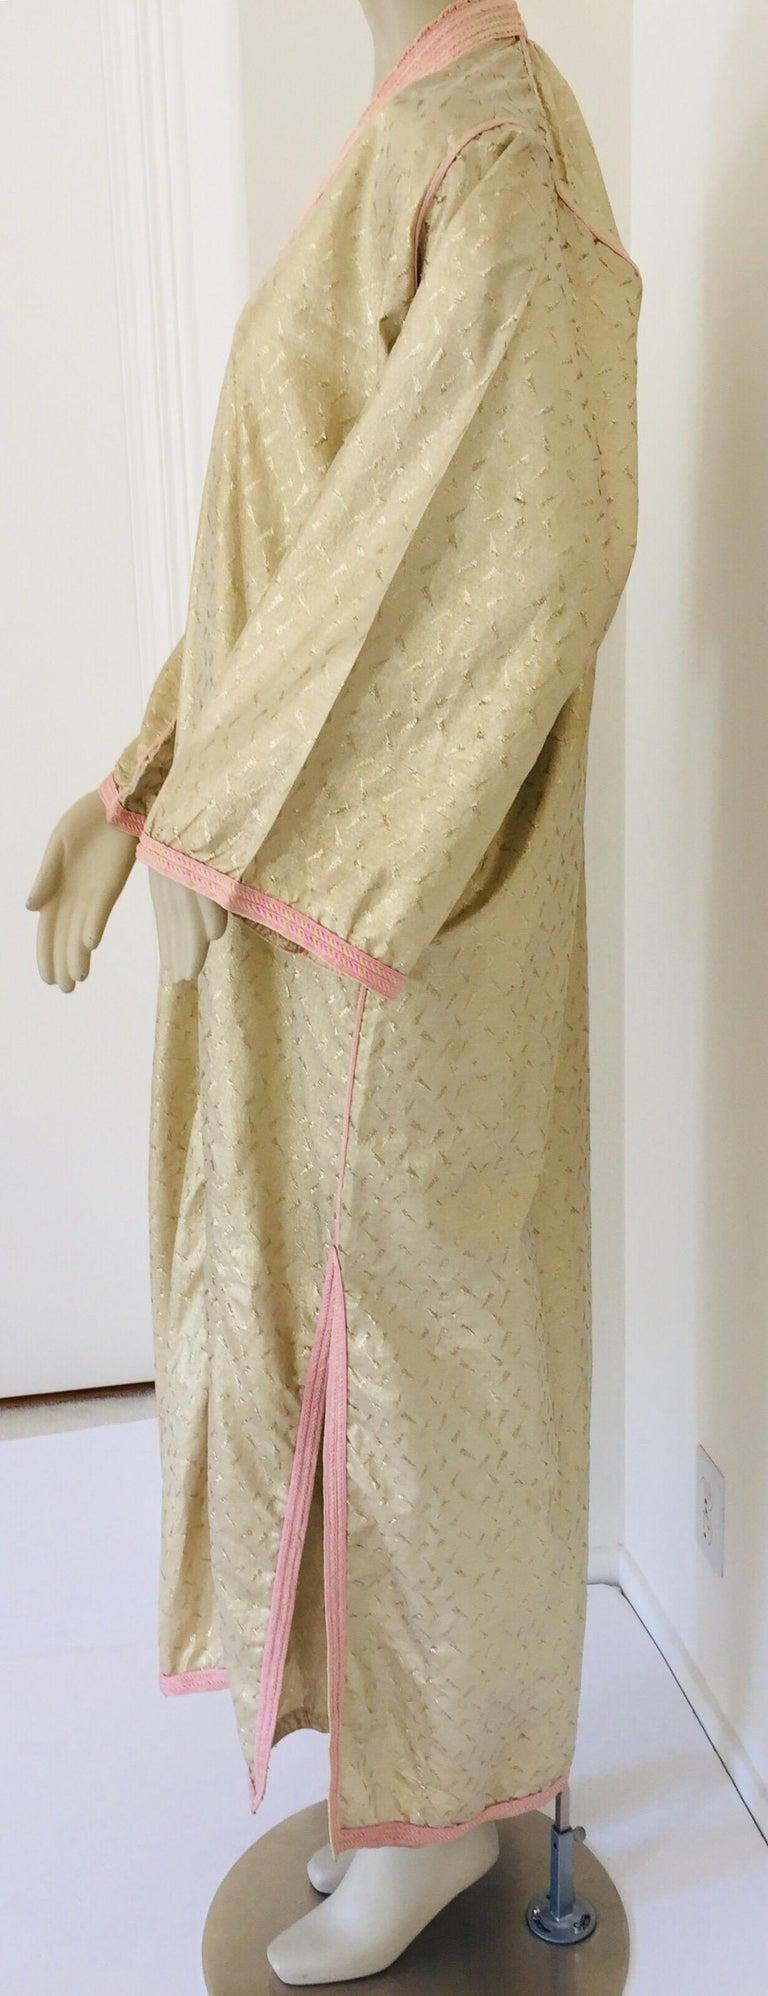 1970s Metallic Gold Moroccan Caftan, Kaftan Maxi Dress North Africa, Morocco For Sale 13